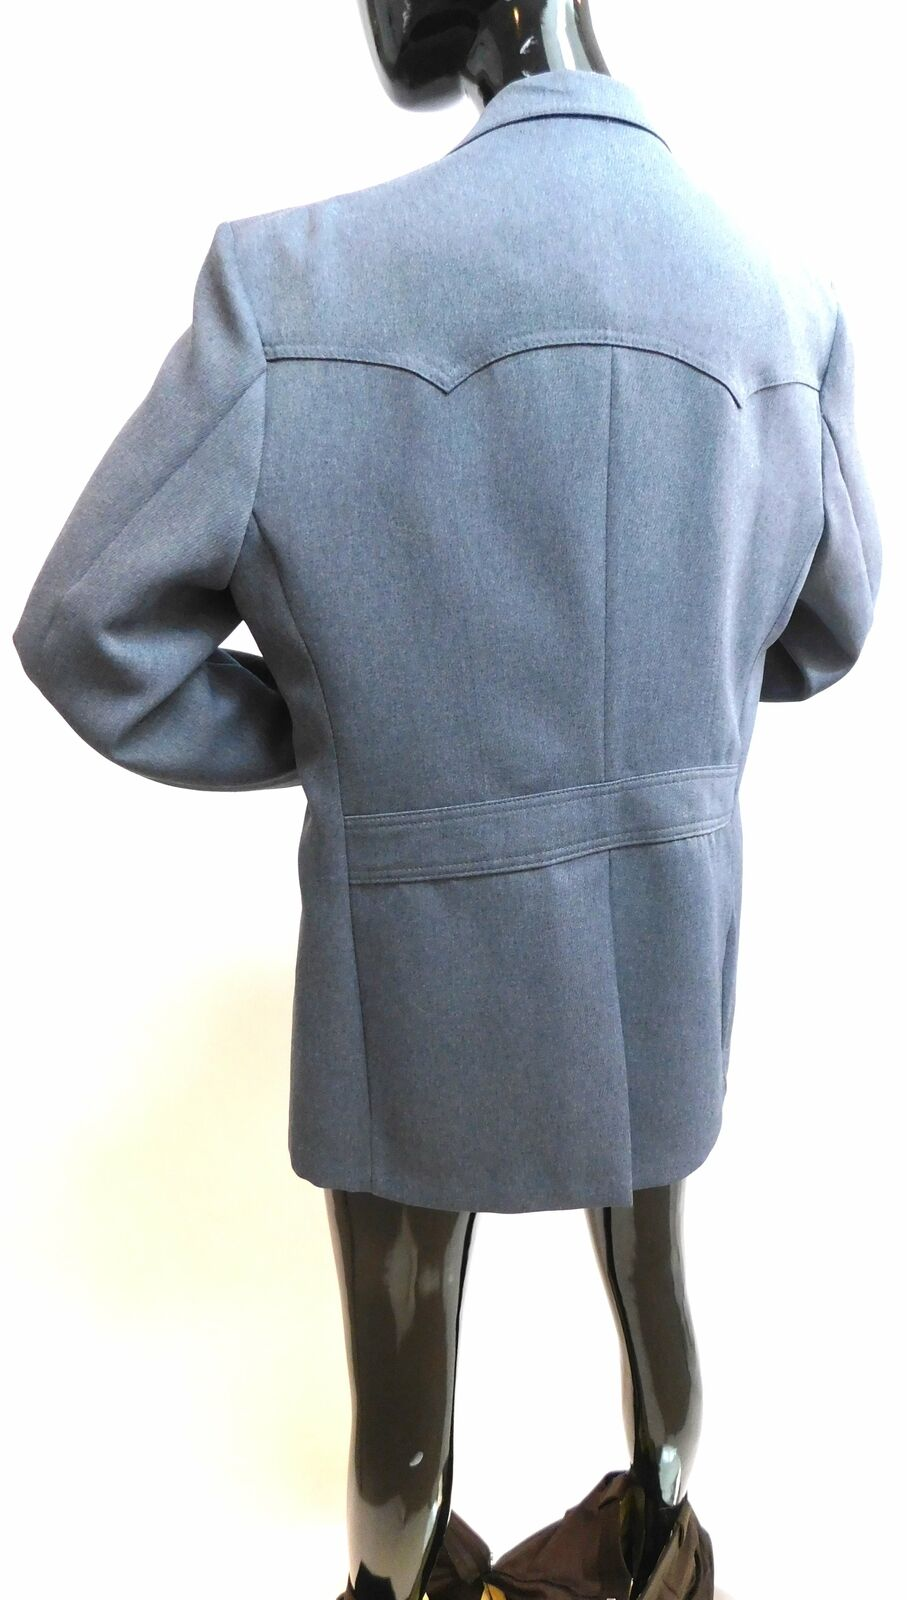 Vintage 1970s Western suit jacket by Levis - image 4